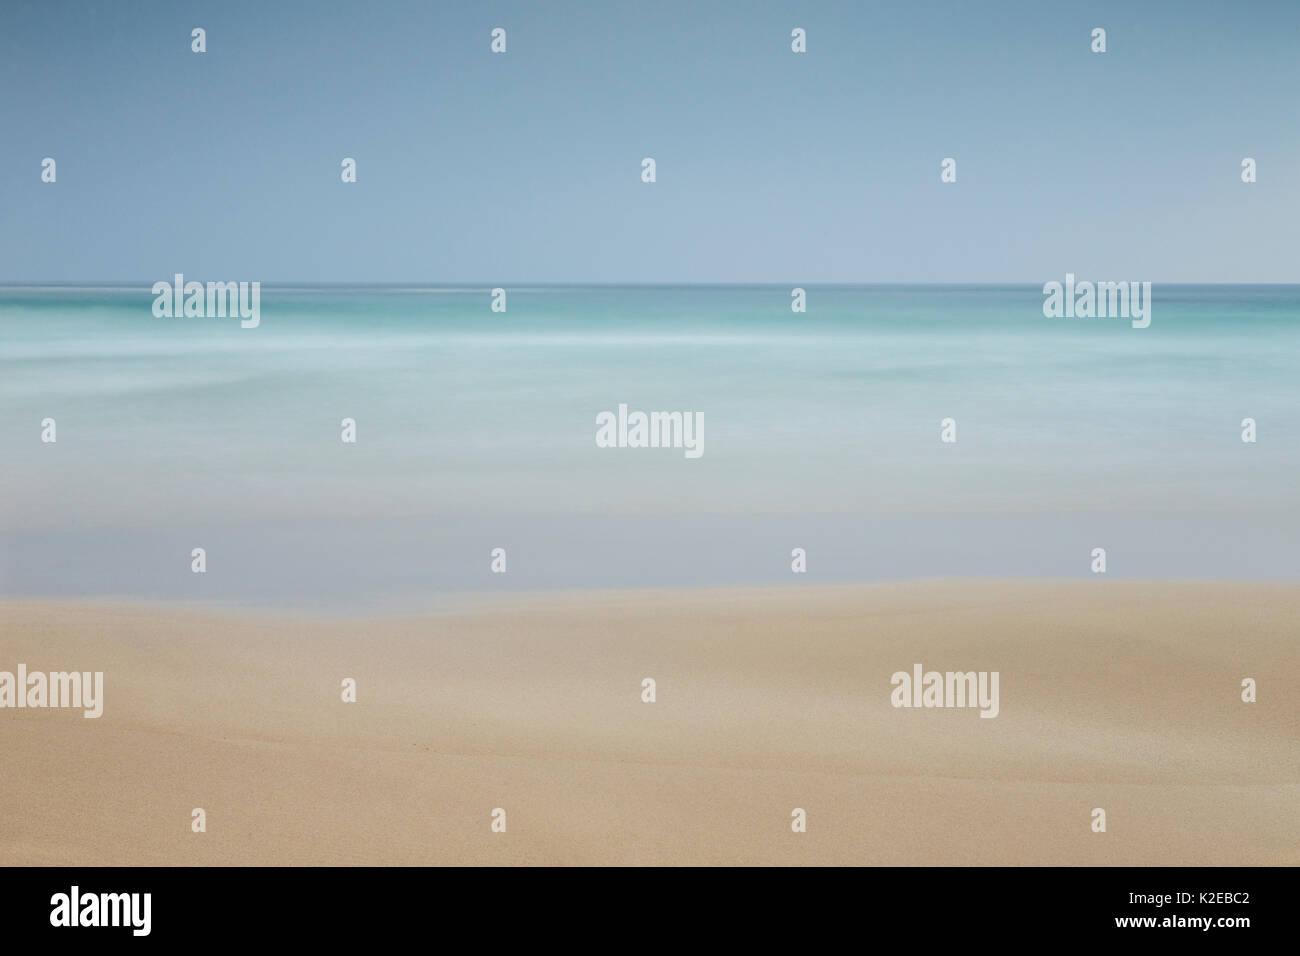 Hebridean beach and ocean, long exposure, Western Isles, Scotland, UK, April 2013. - Stock Image